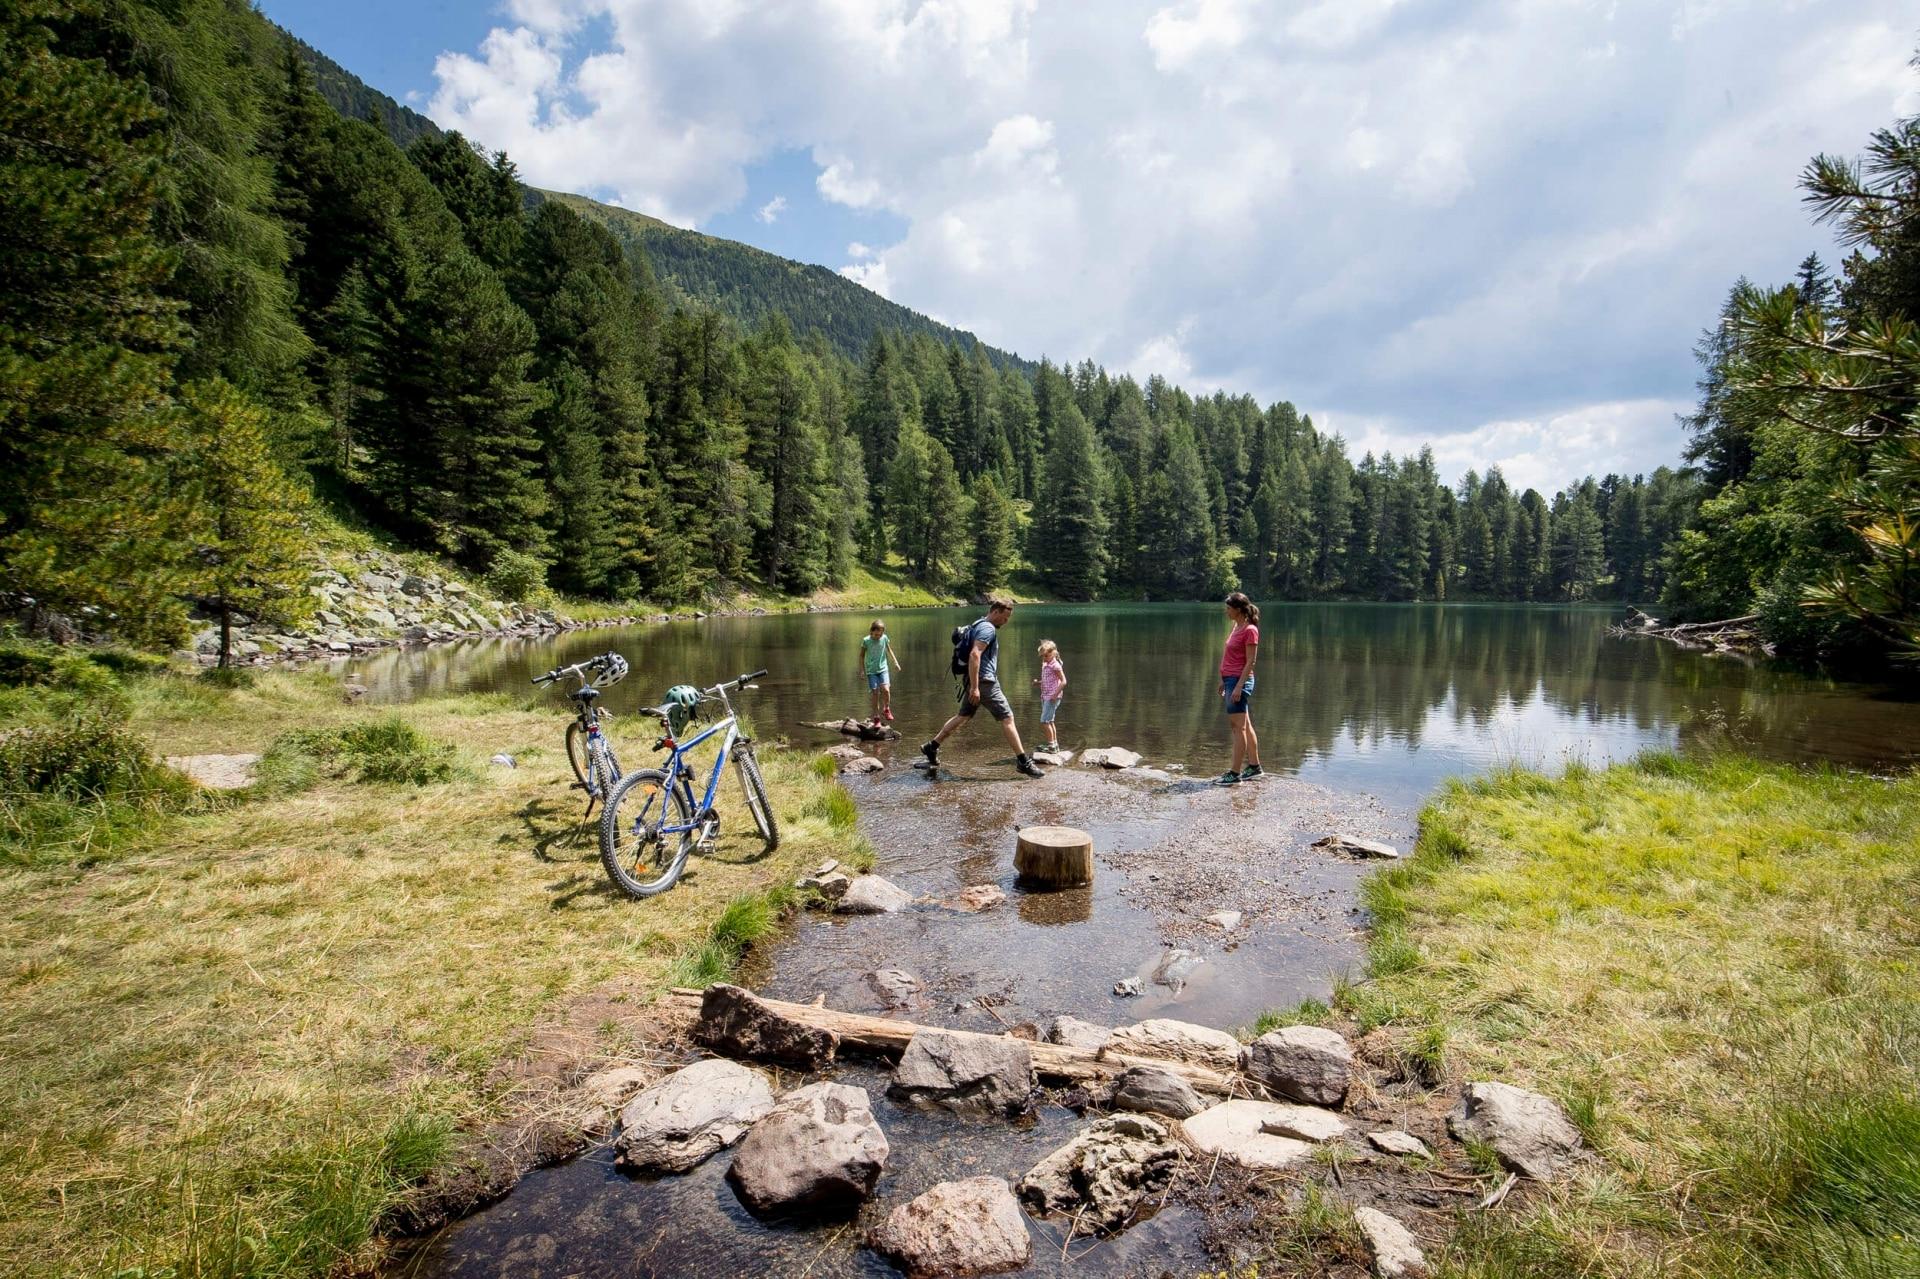 Pause der Radfahrer am See © Murau Tourismus - Tom Lamm